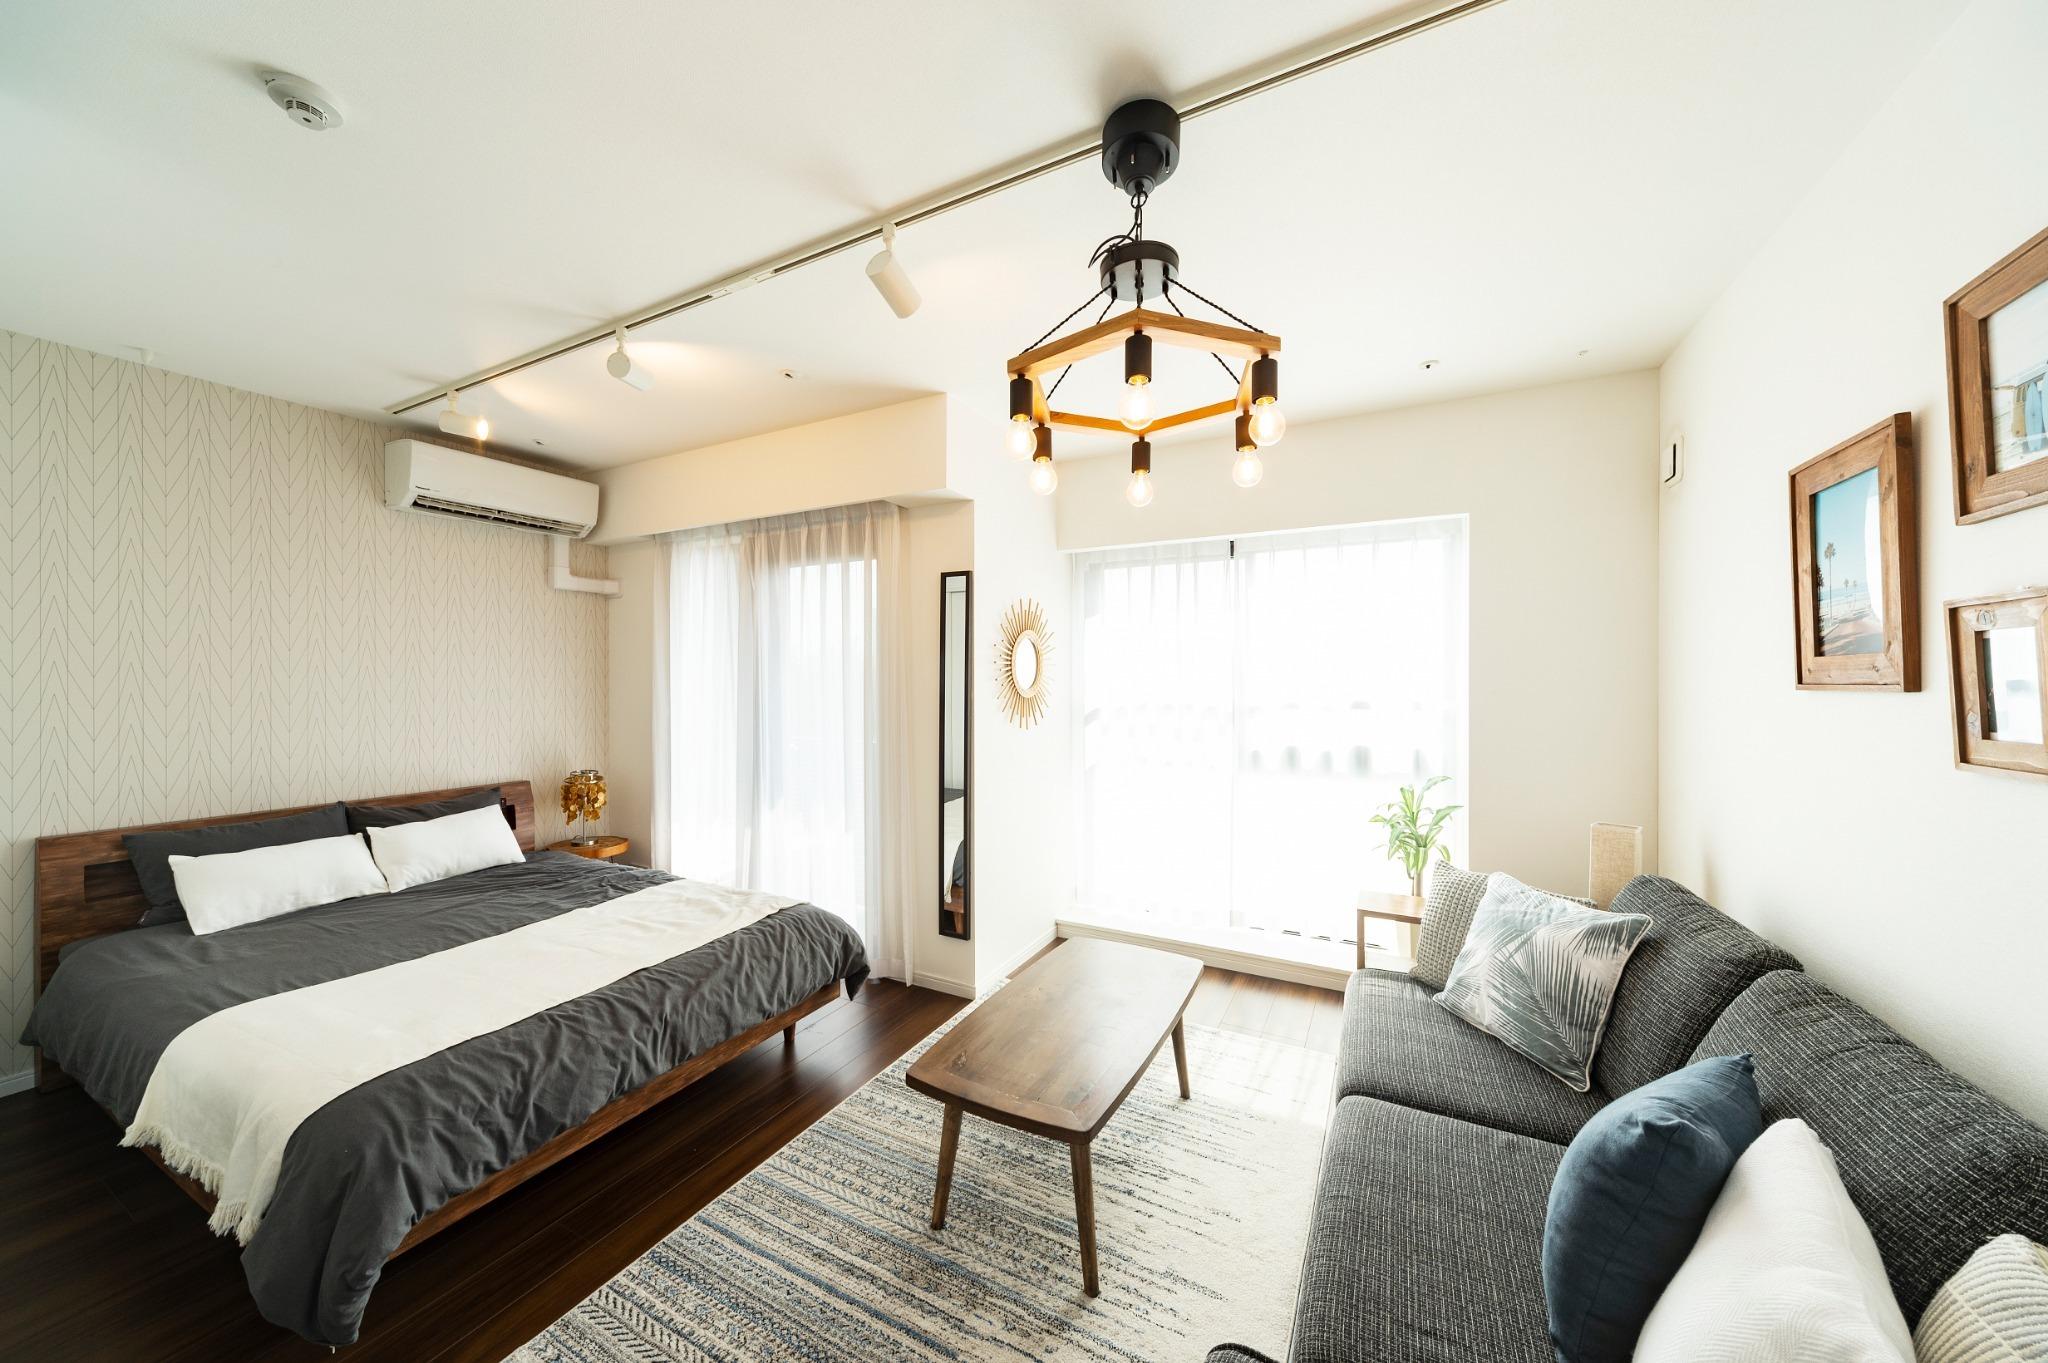 GH501*東中野駅、落合駅徒歩4分、キッチン、洗濯機付きの30平米1Kの住居型ホテル